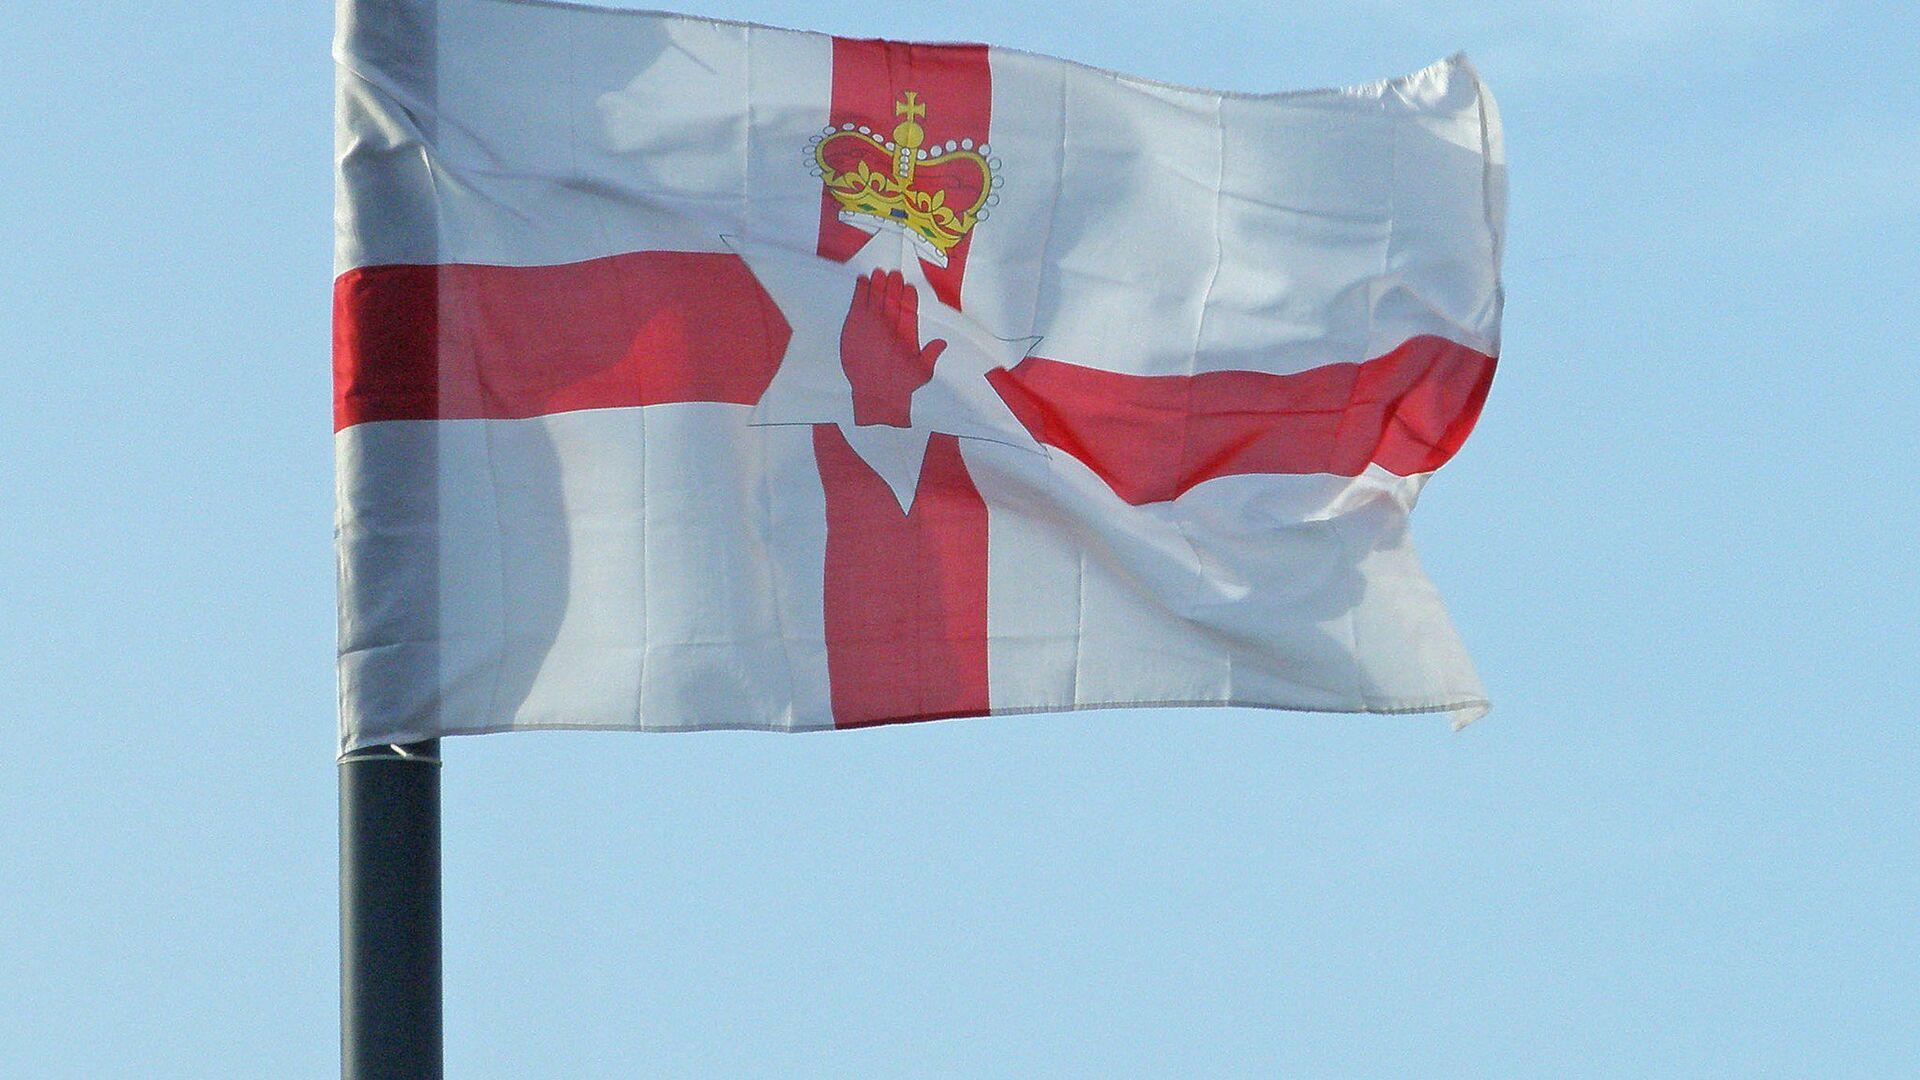 Bandera de Irlanda del Norte - Sputnik Mundo, 1920, 09.04.2021